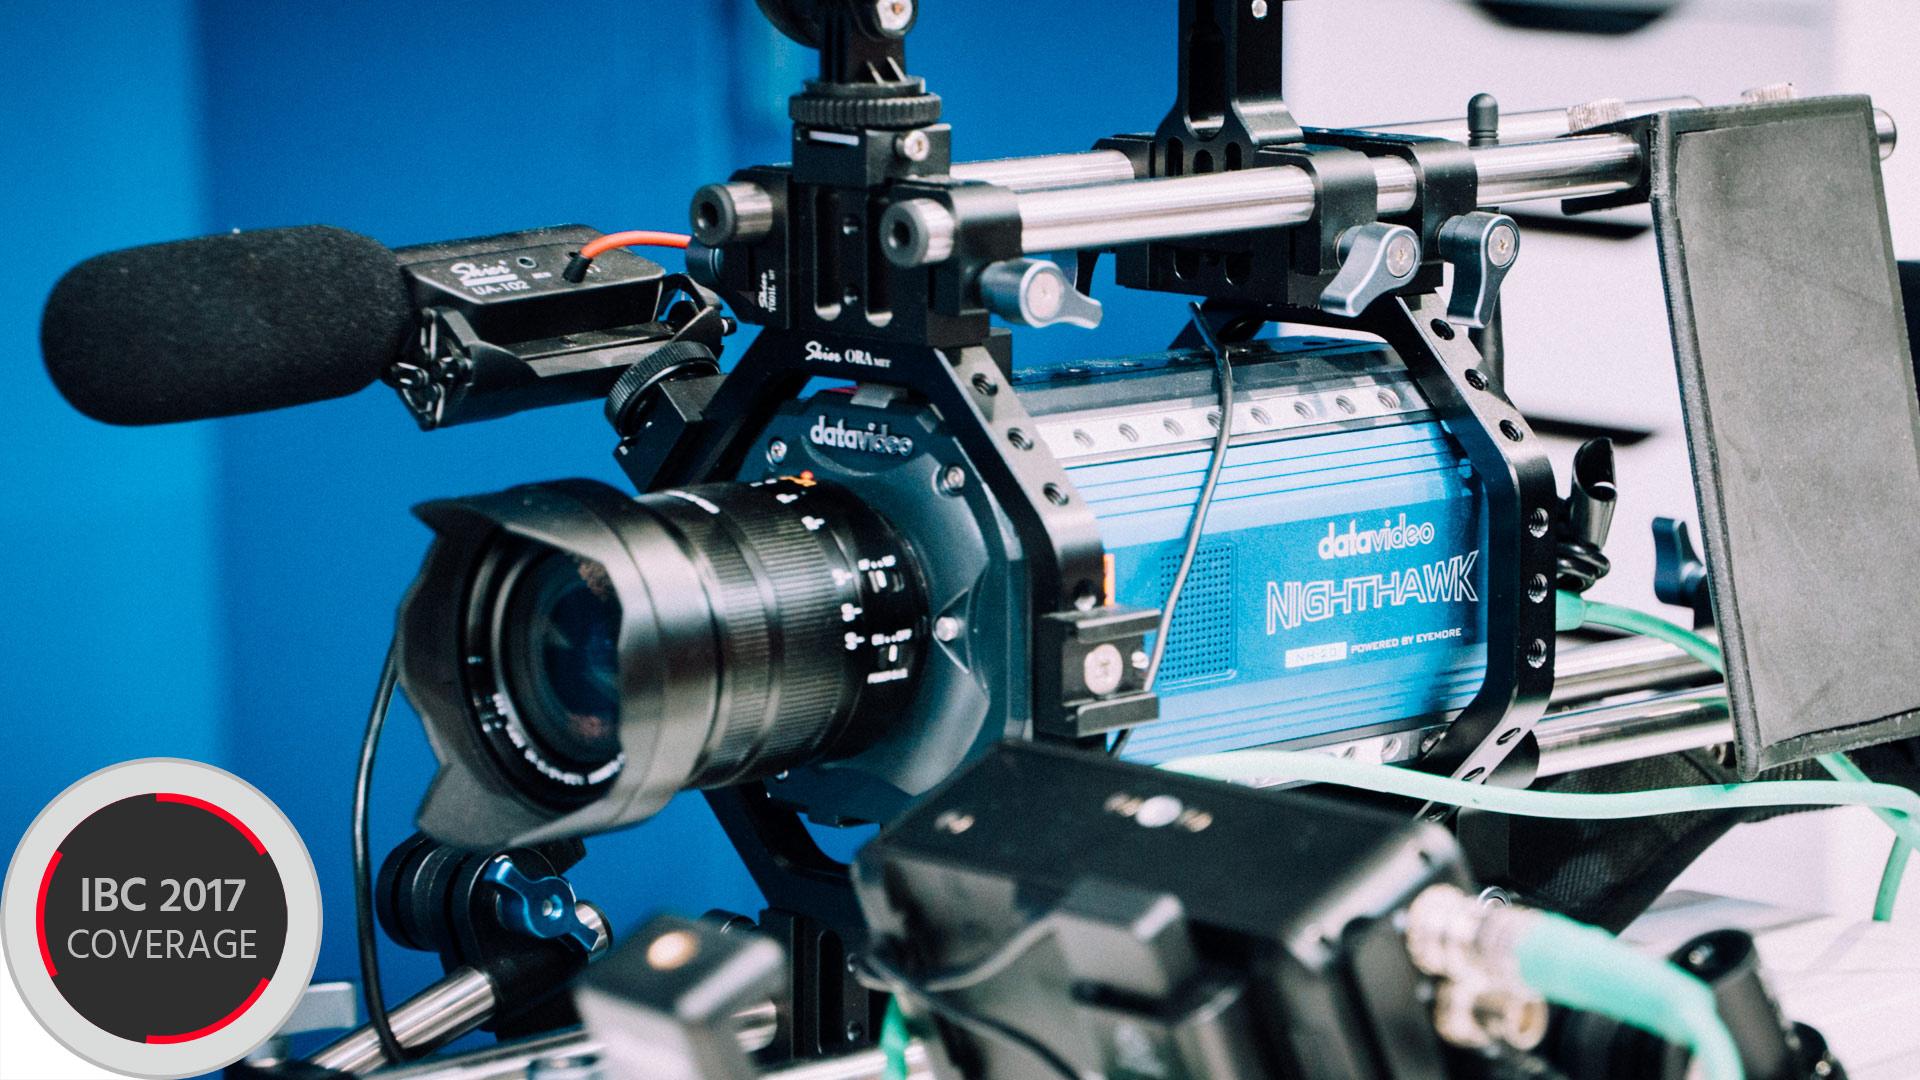 DatavideoがNighthawkでプロカメラ市場に参入